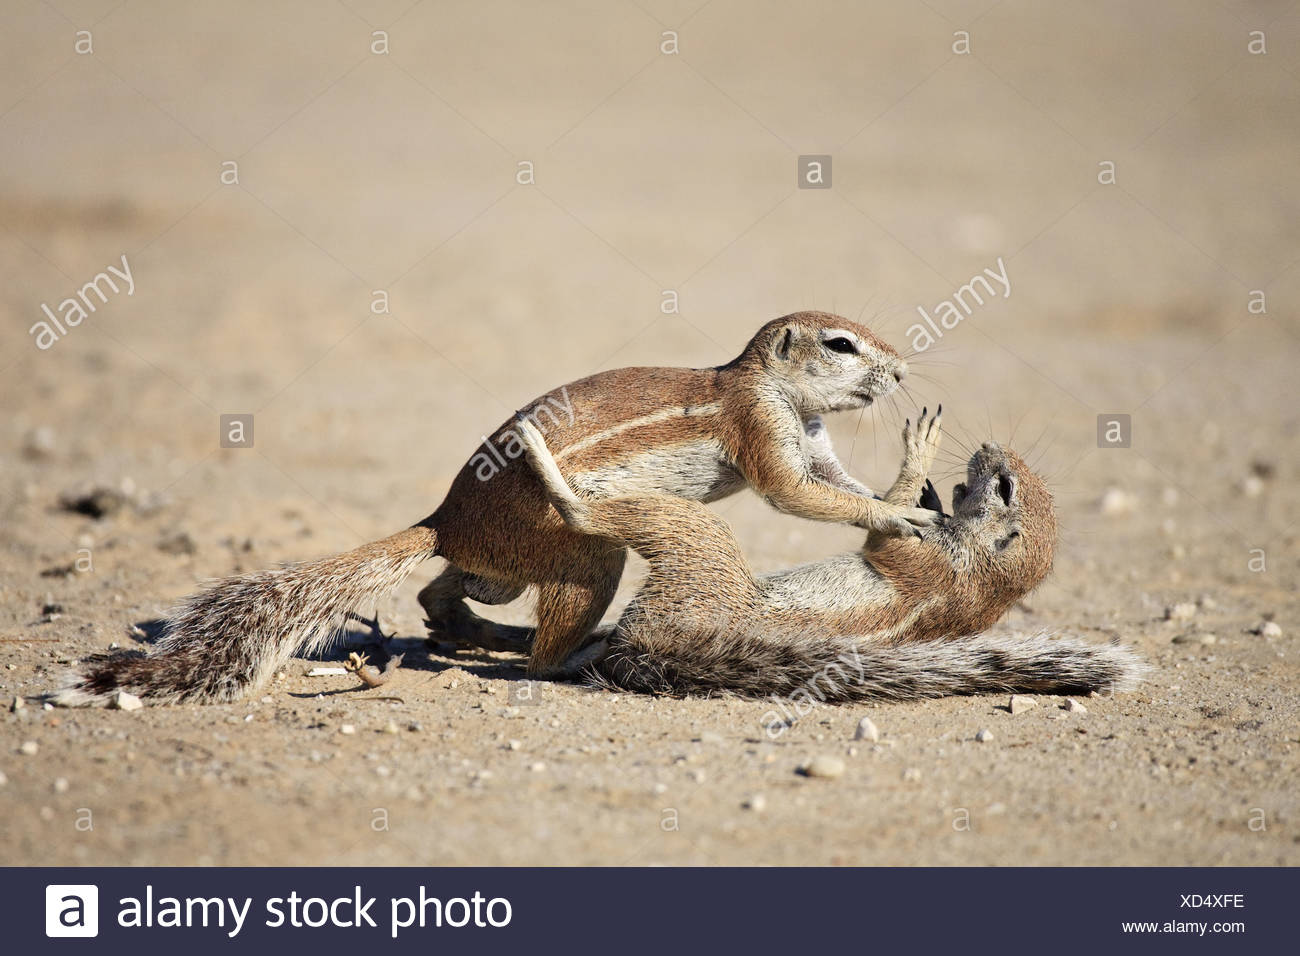 Terra africana scoiattolo Immagini Stock